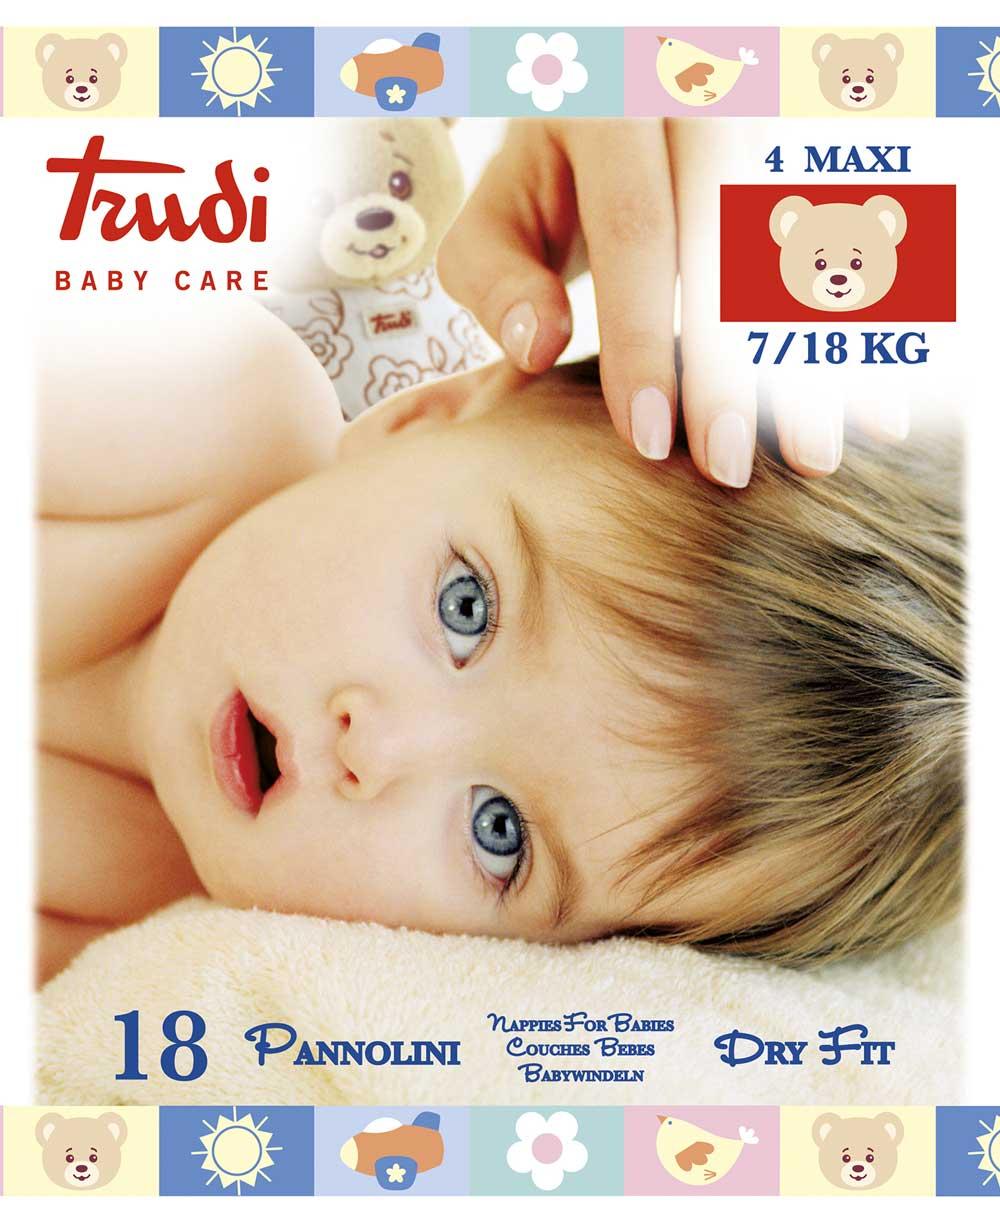 Image of Pannolini Dry Fit Taglia Maxi 7/18kg Trudi Baby Care 18 Pannolini